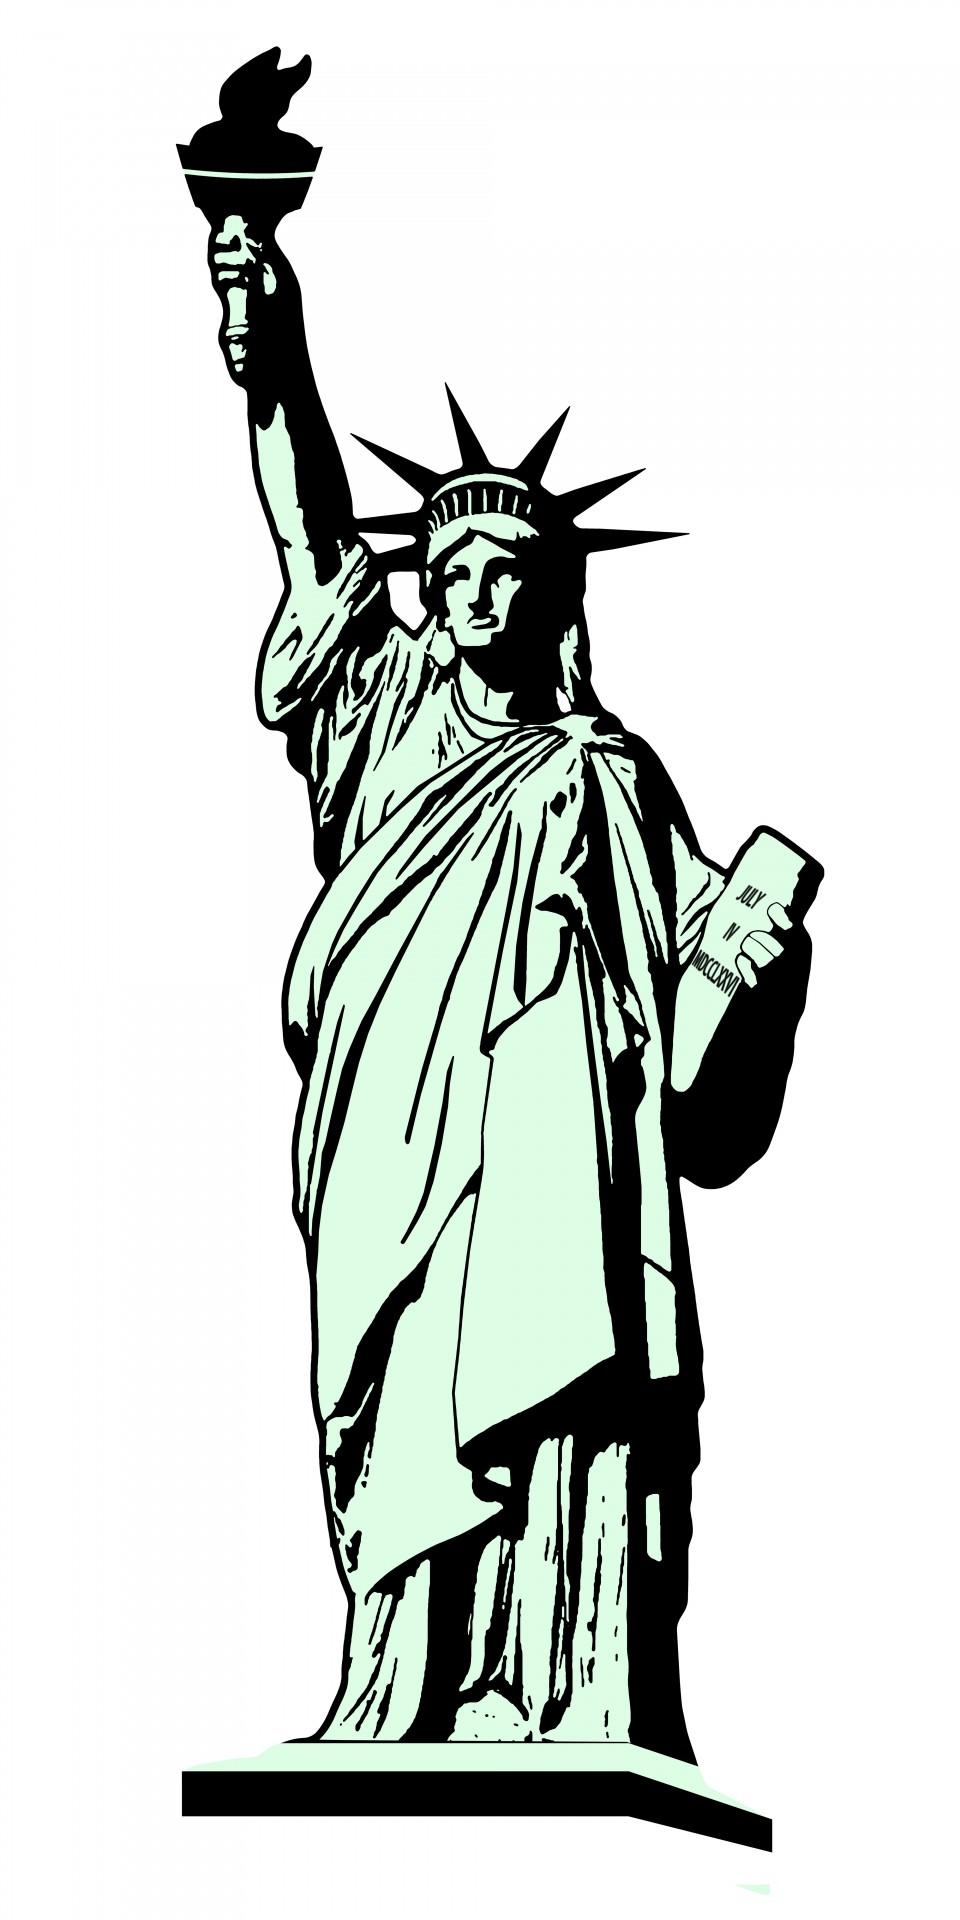 960x1920 Statue Of Liberty Illustration Free Stock Photo